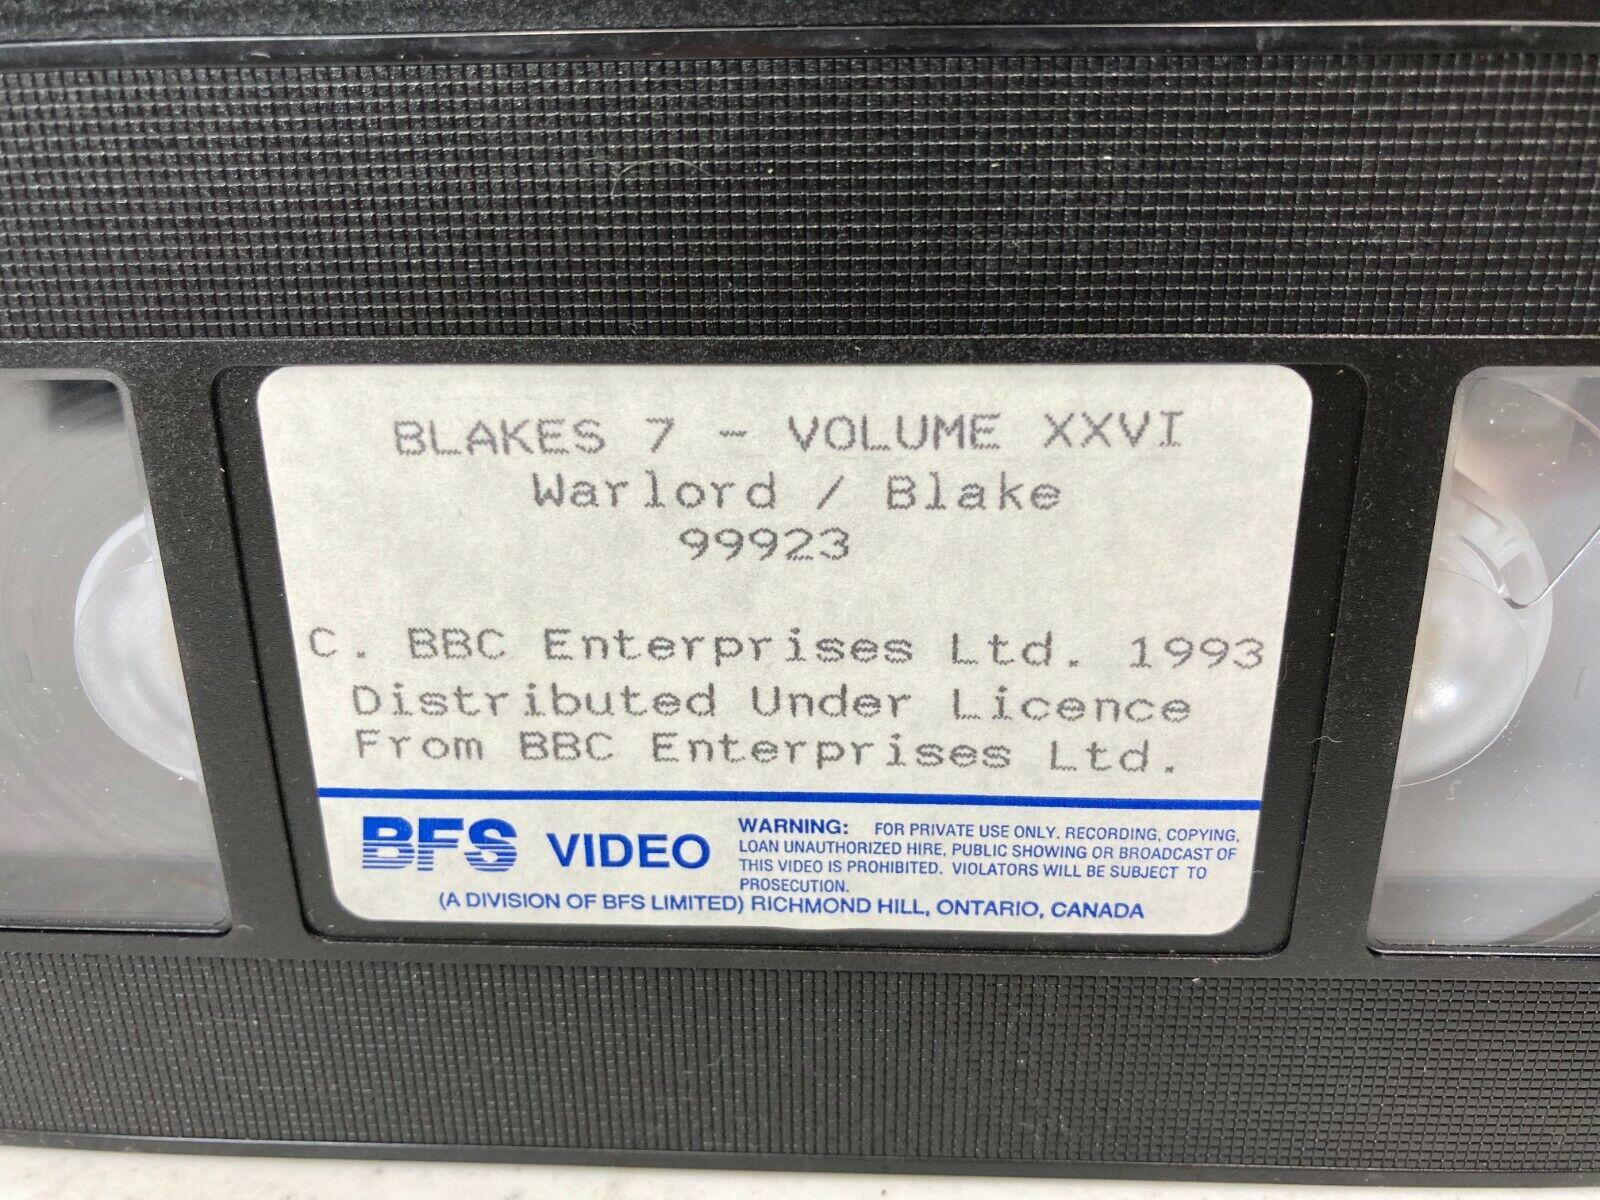 Blakes 7 Vol 26 Warlord Blake VHS BFS Video BBC - $19.95